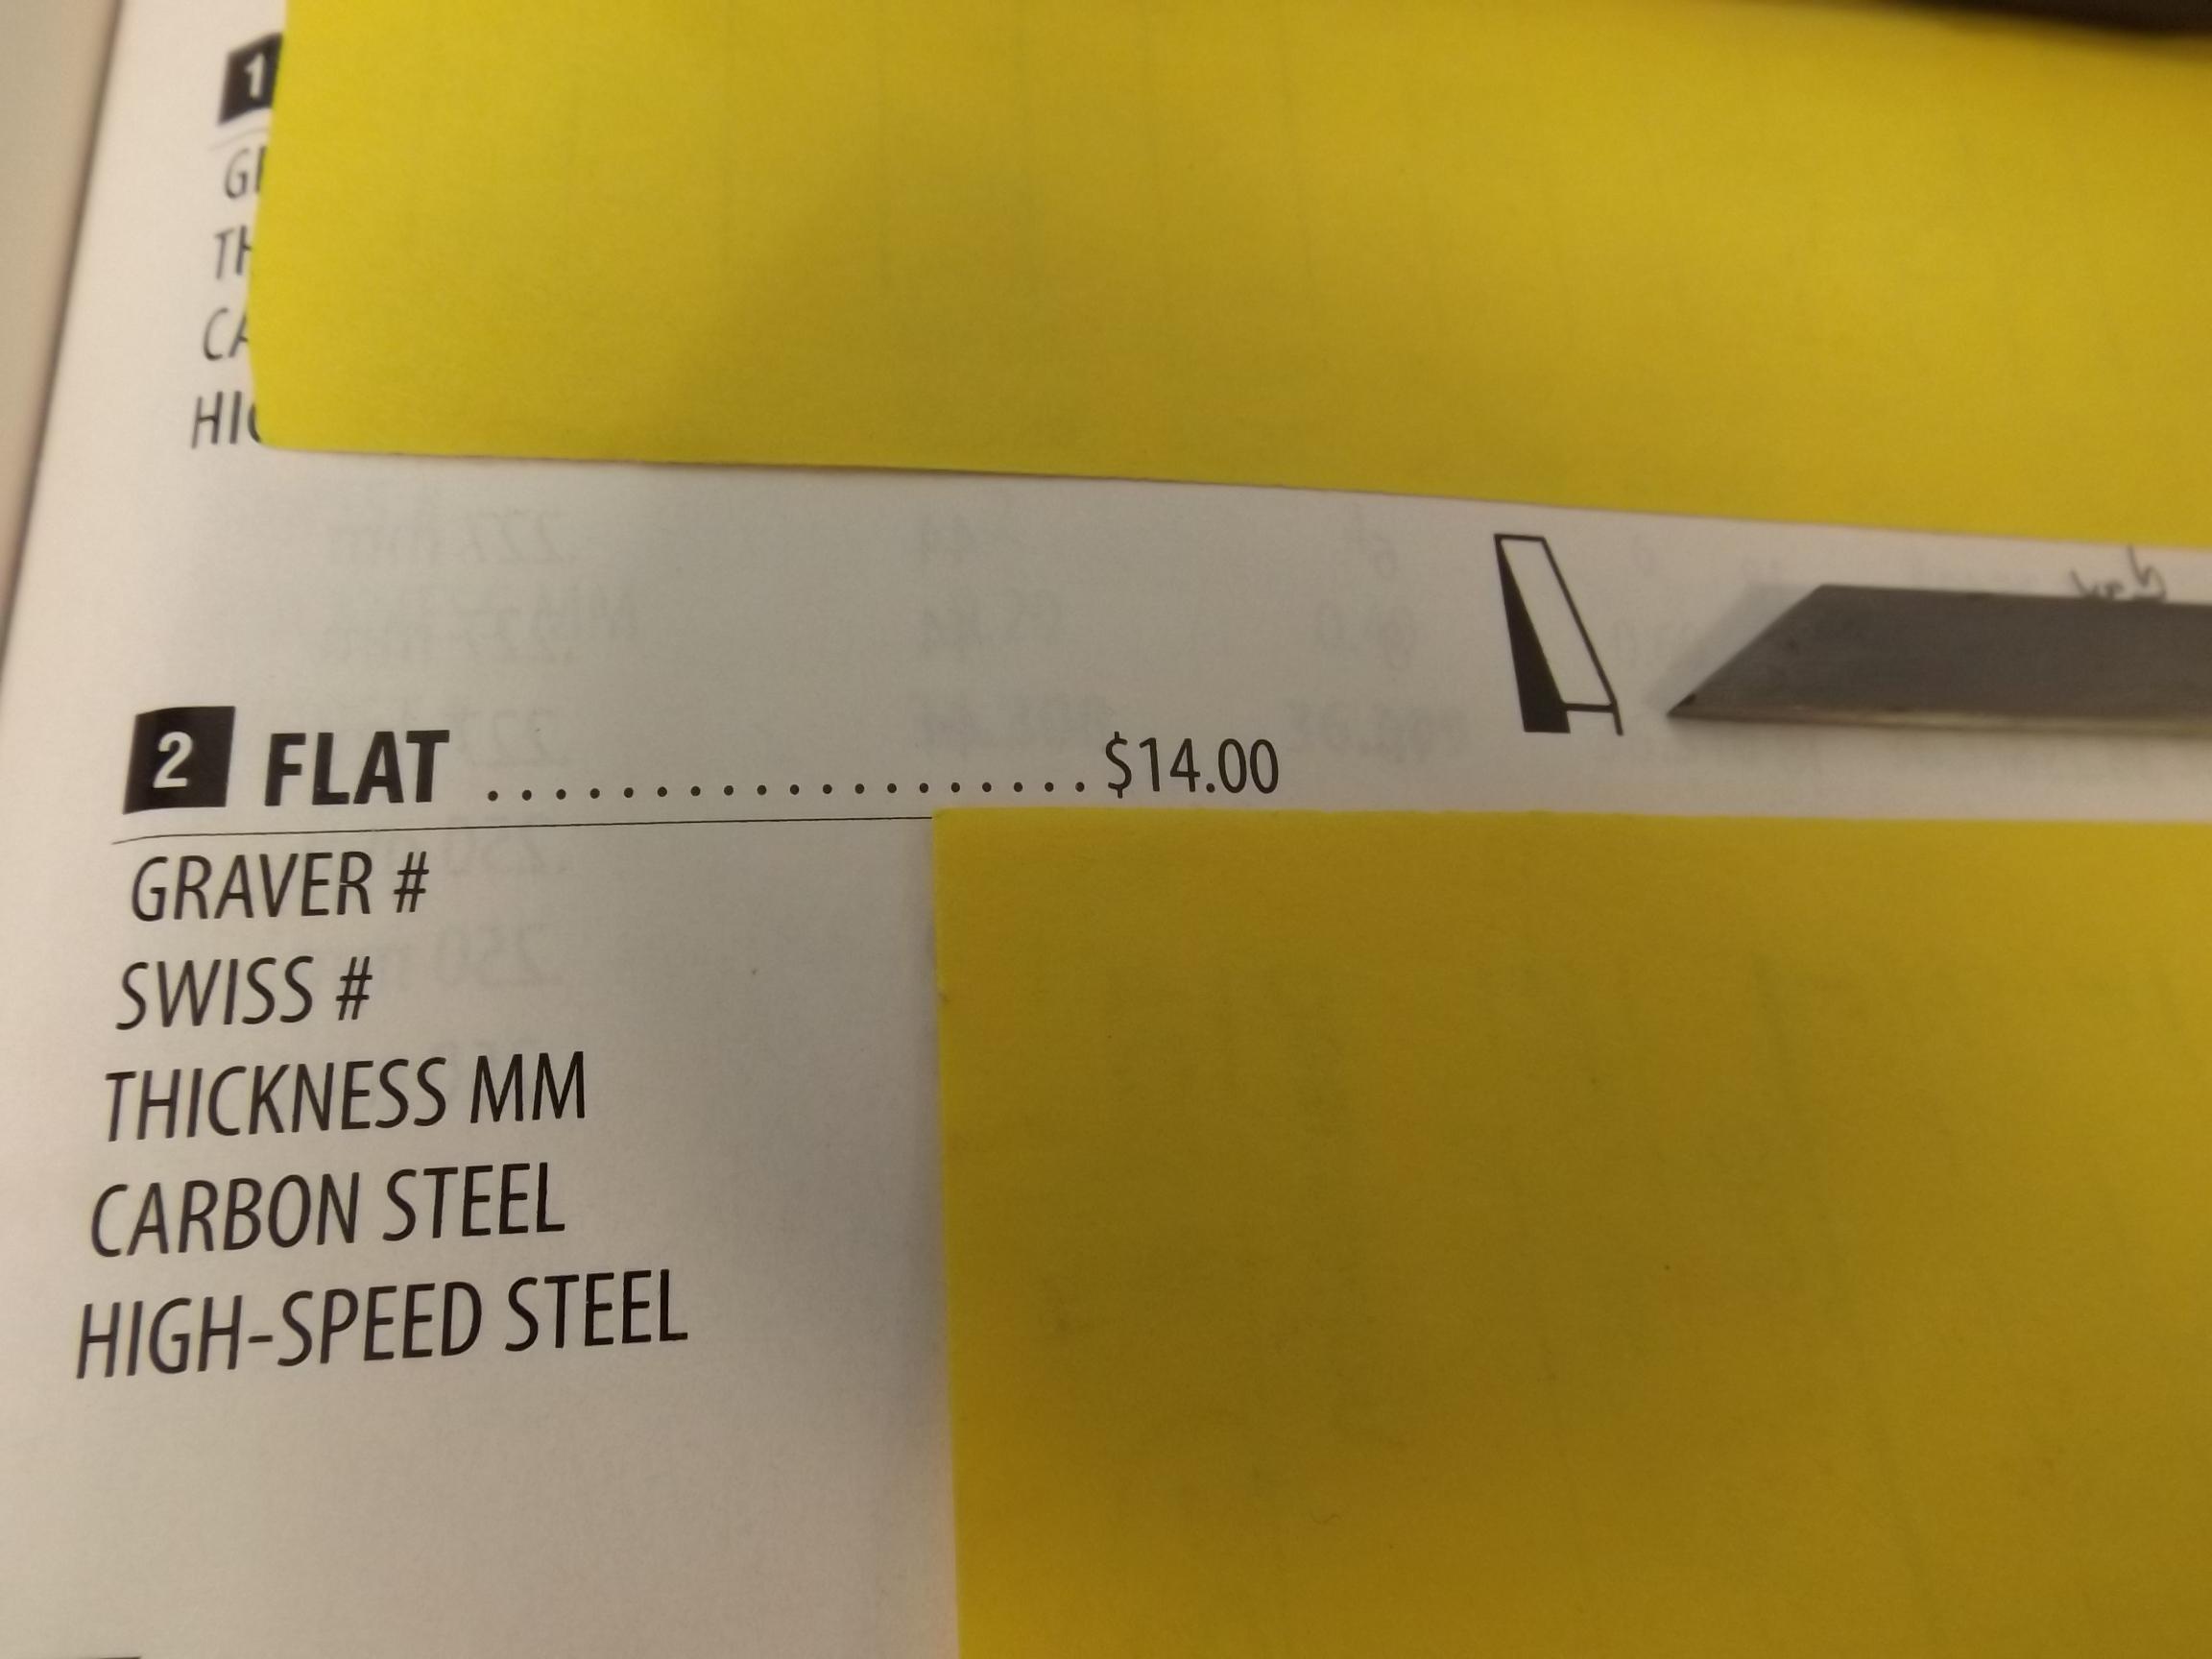 GR500/41 Grobet Carbon Steel Gravers- Flat #36.141